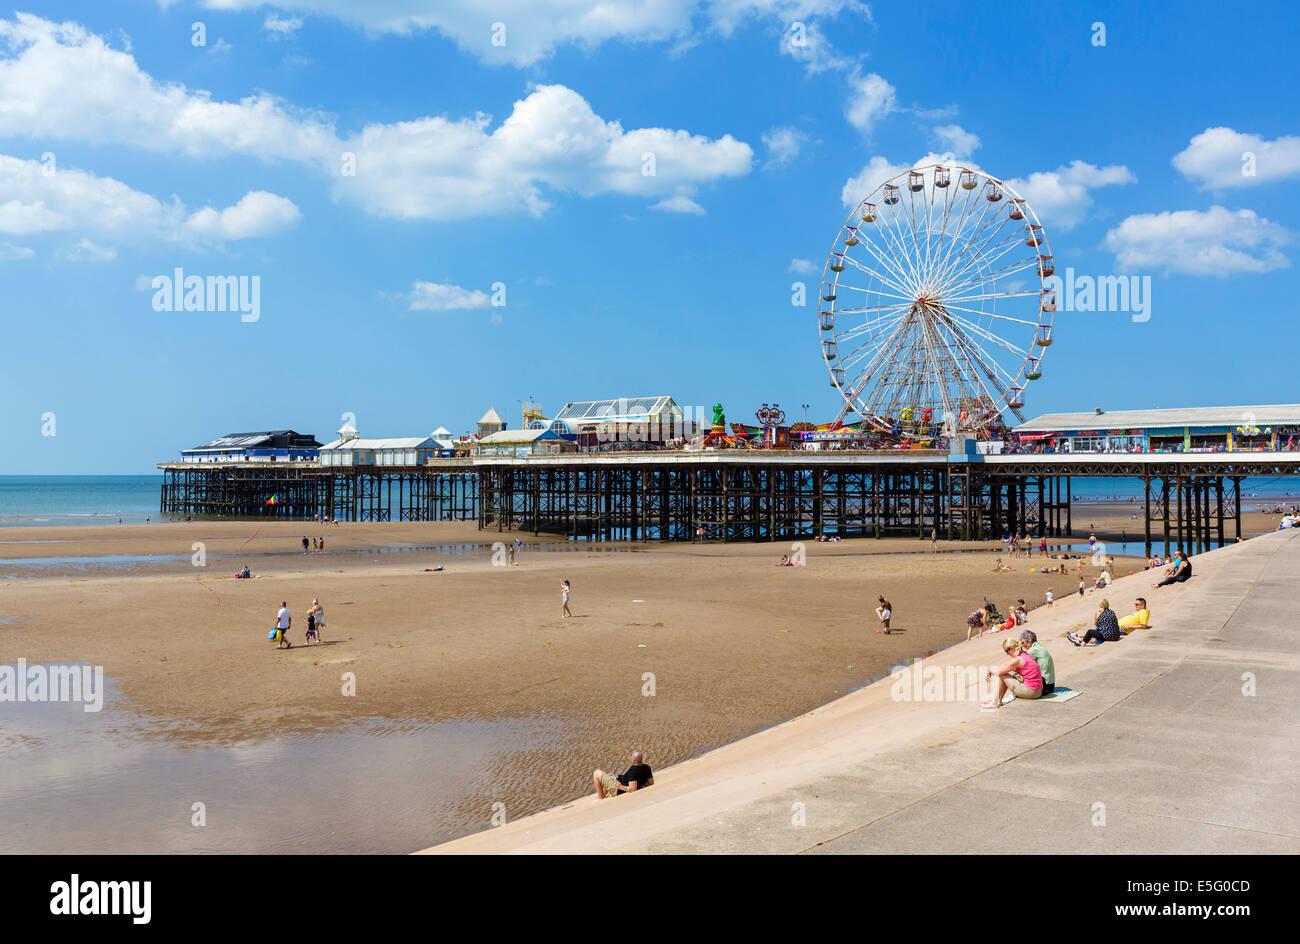 Central Pier, La Milla de Oro, Blackpool, Lancashire, UK Imagen De Stock